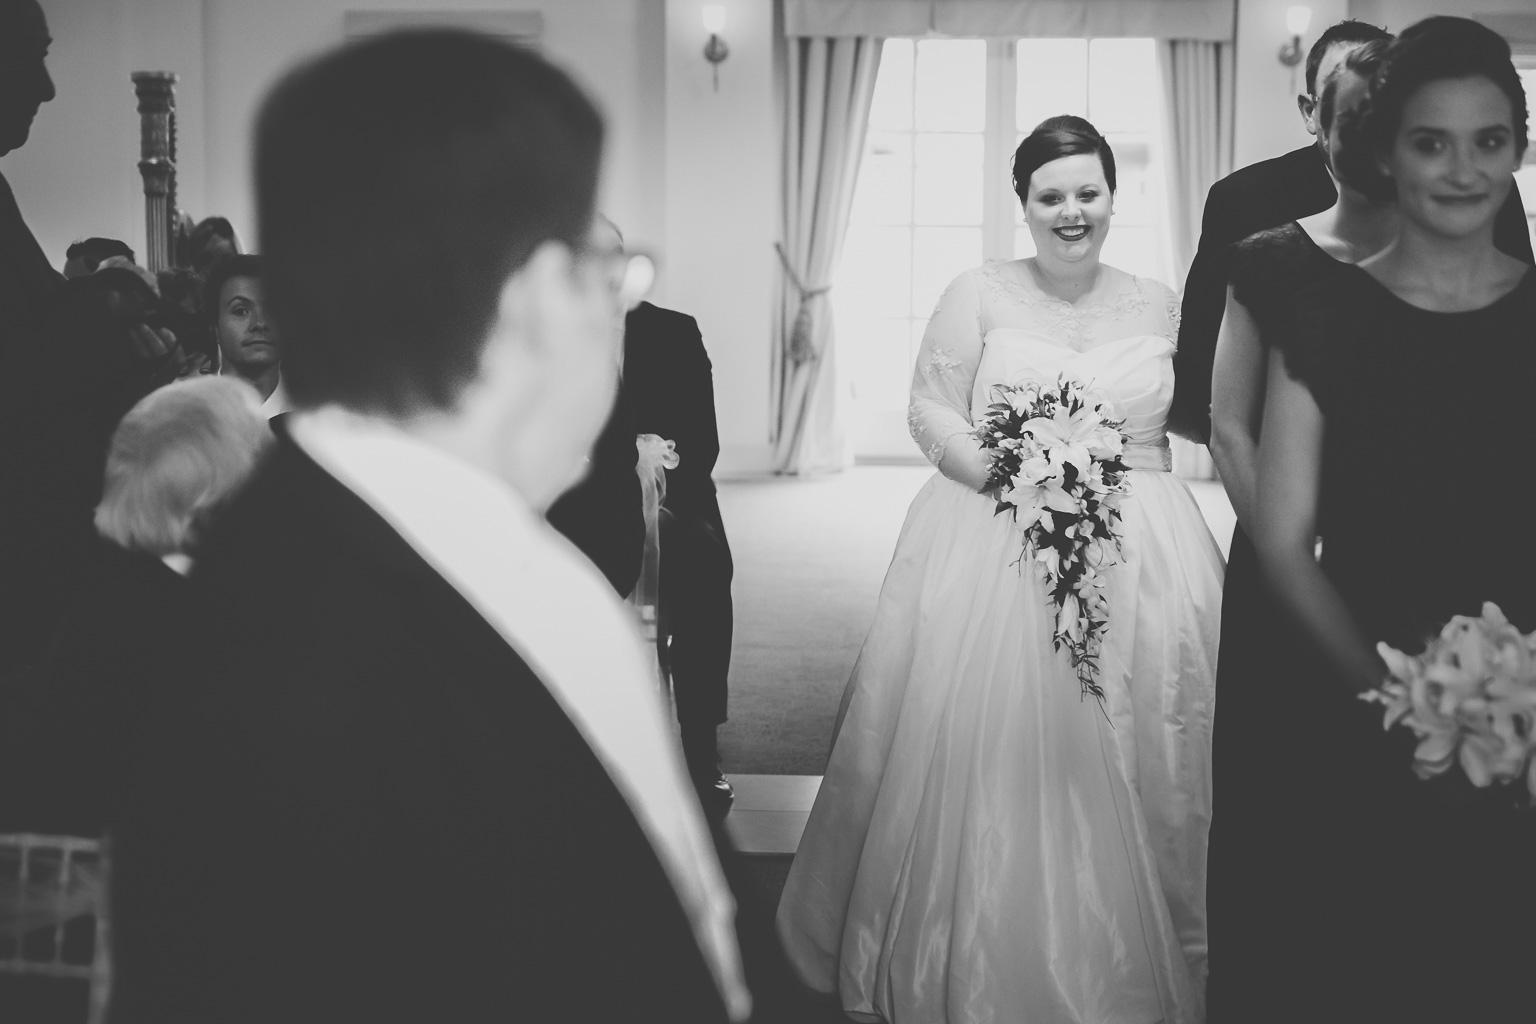 Documentary-wedding-photographer-00012